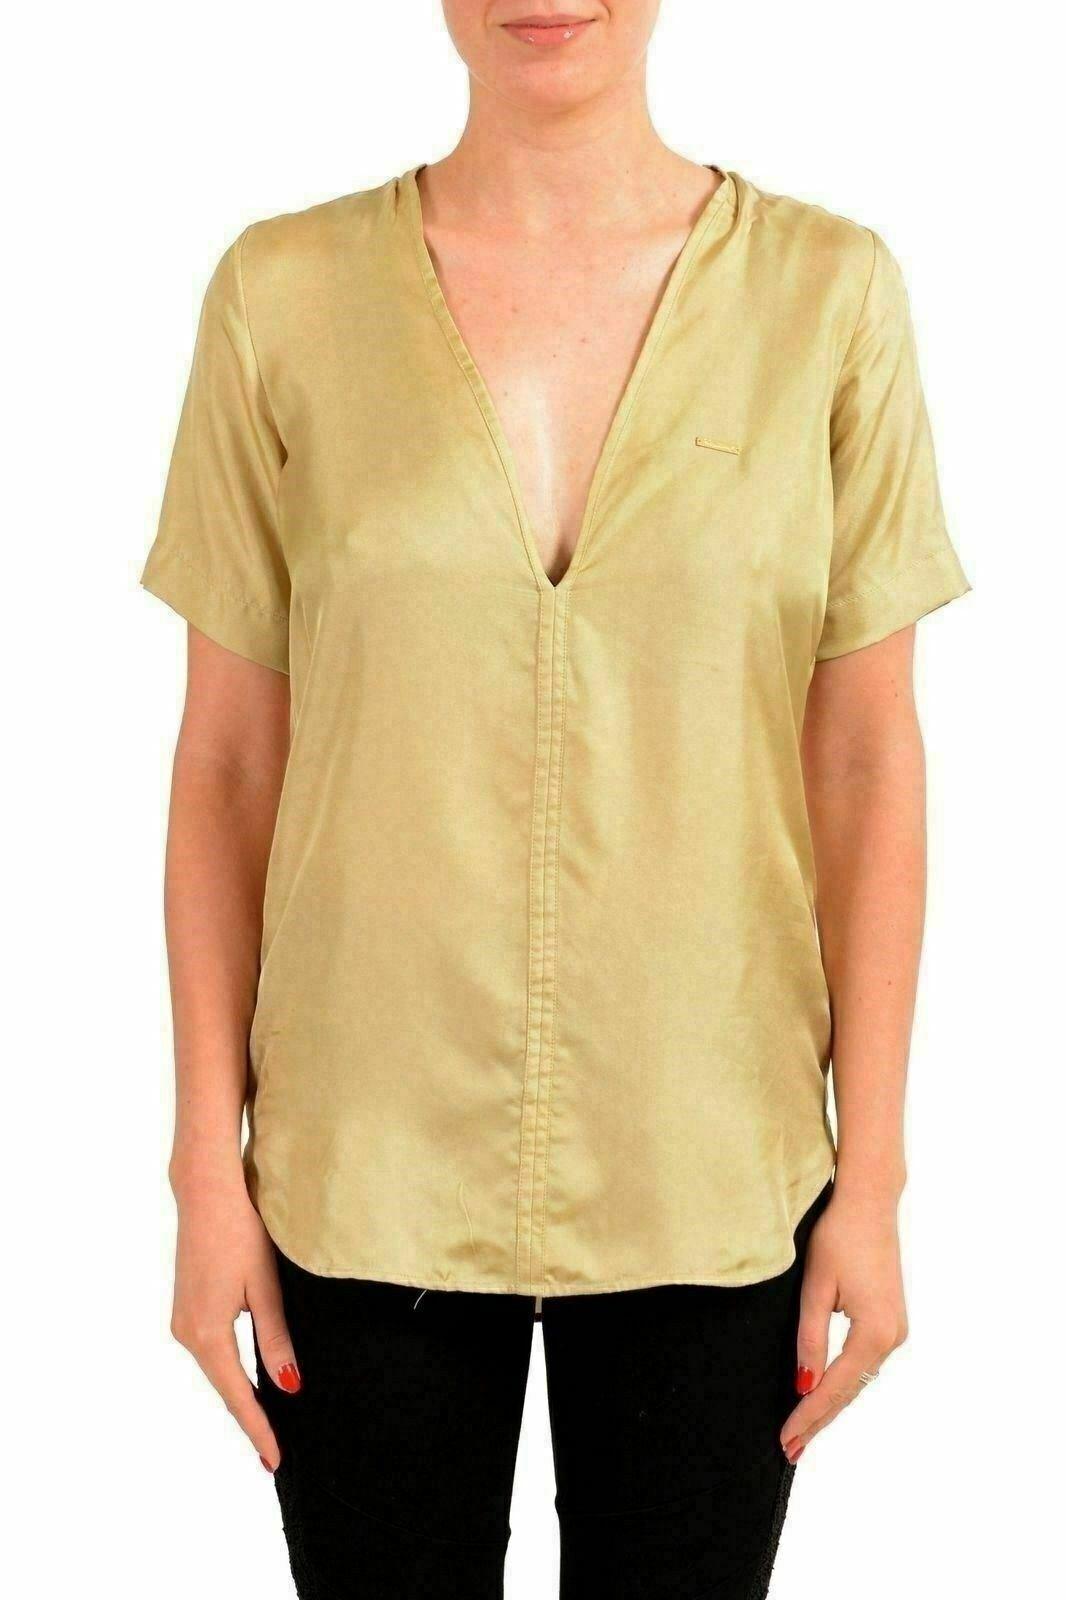 Dsquared2 Women'S 100% Silk Beige Short Sleeve Blouse Top US S IT 40